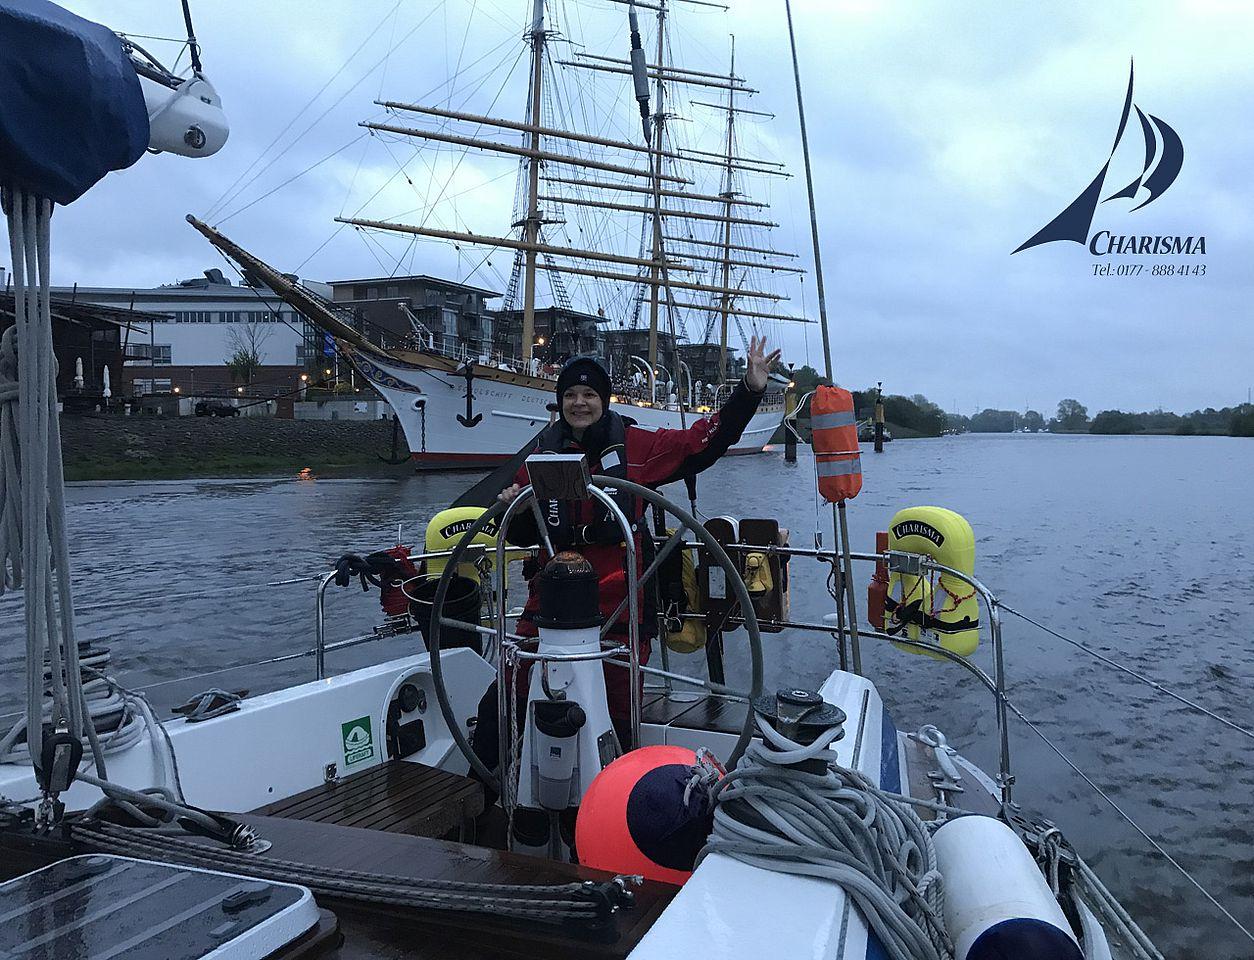 Adieu Bootswerft Winkler